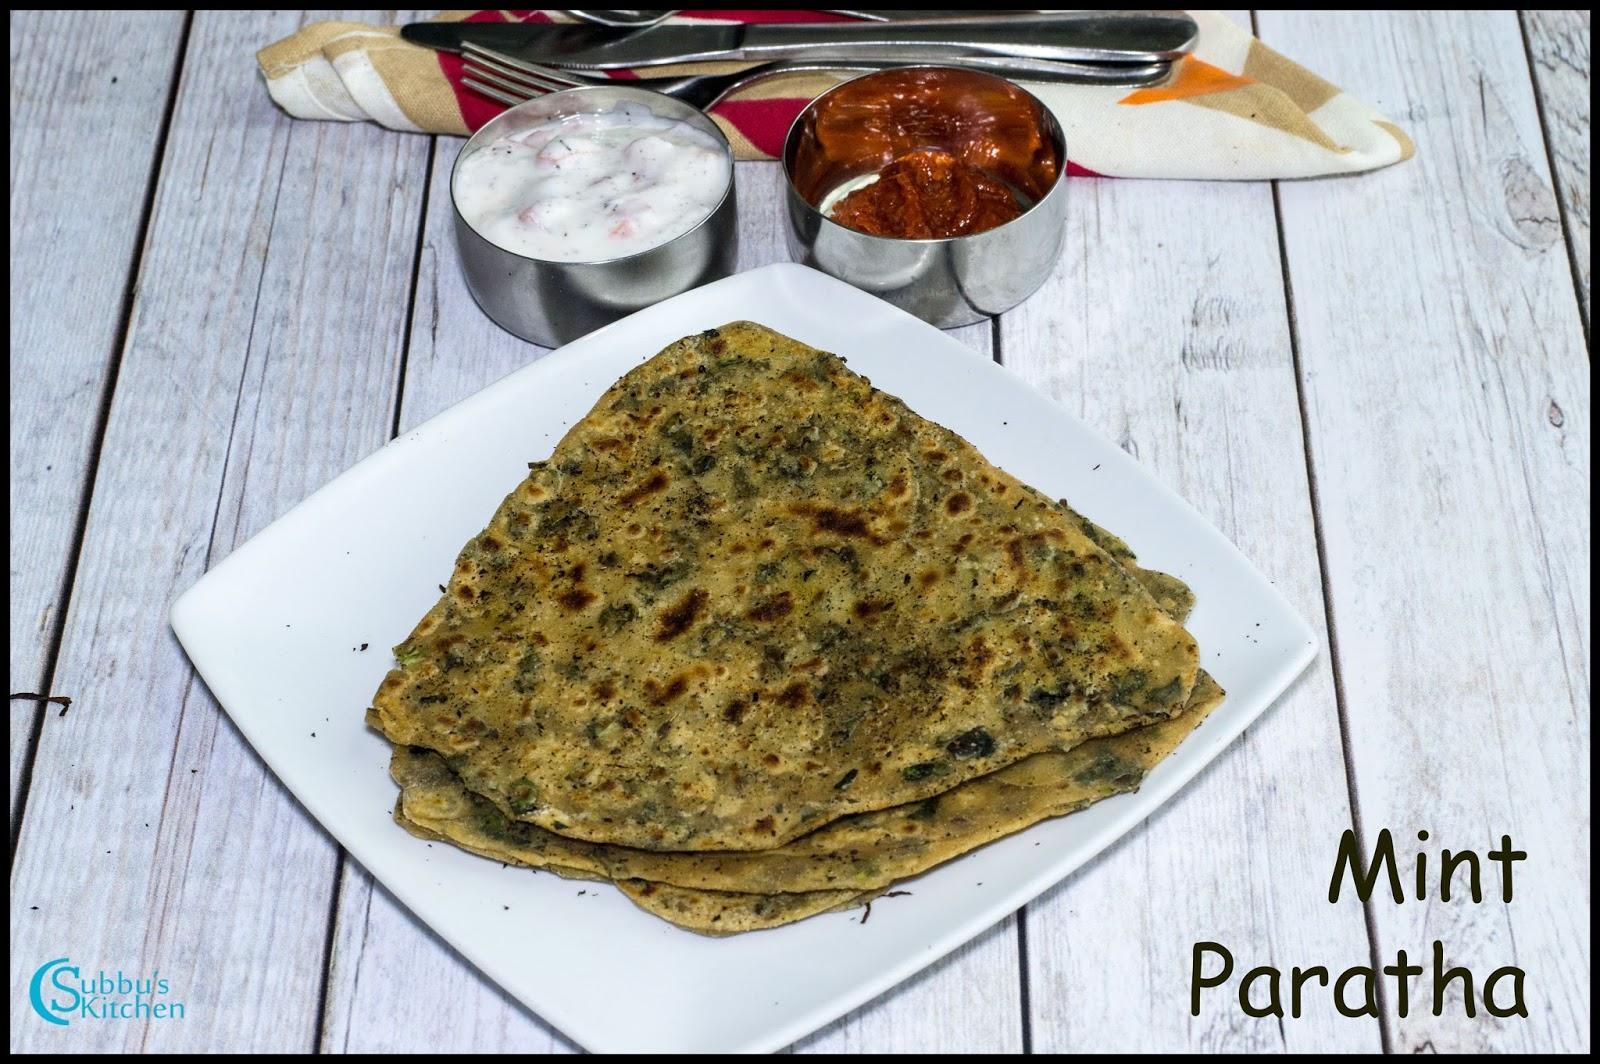 Mint Paratha Recipe   Pudina Paratha Recipe - Subbus Kitchen